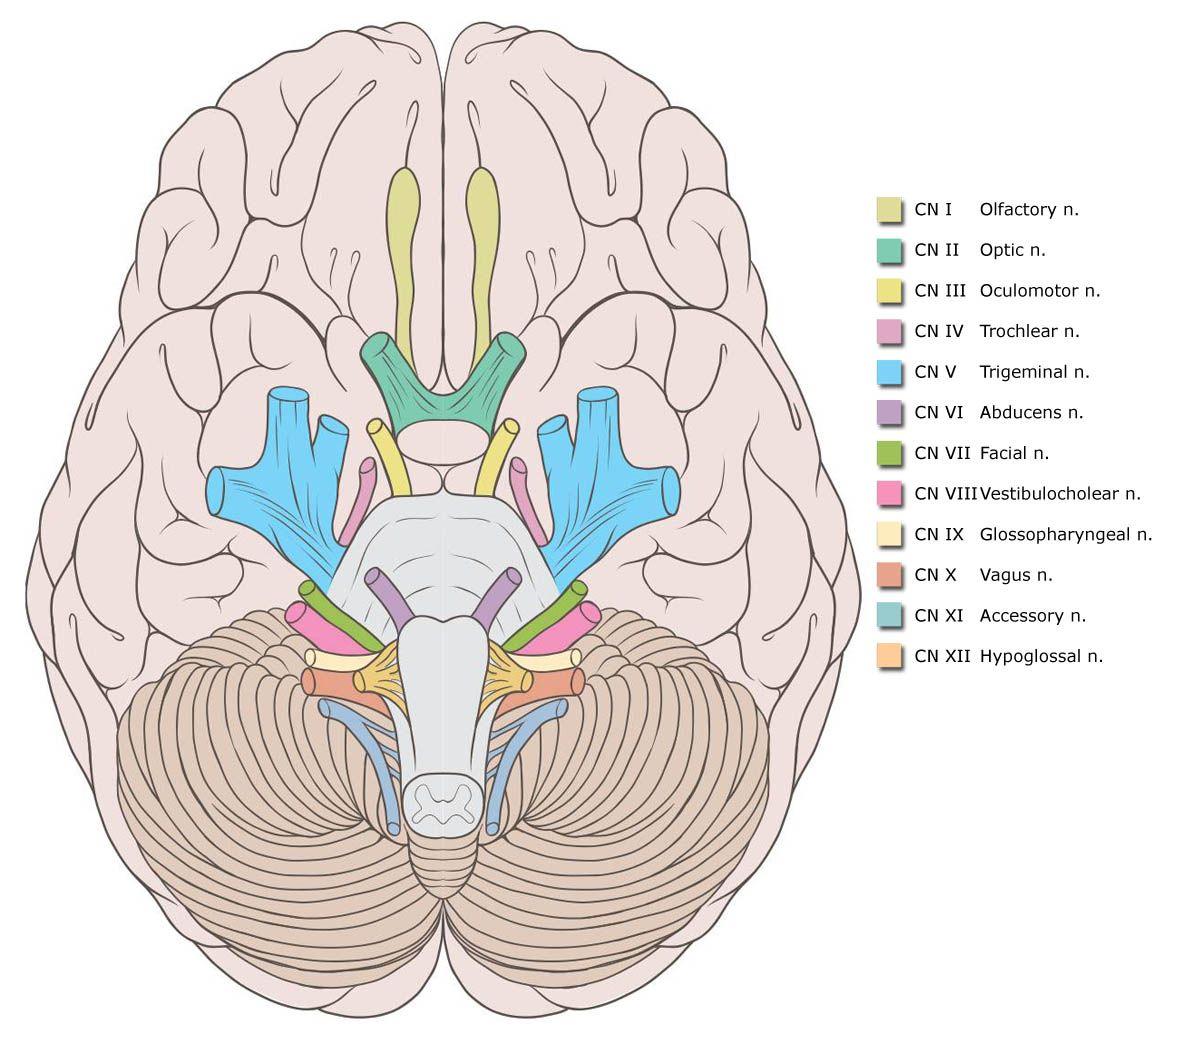 Cranial Nerves Google Search Cranial Nerves Brain Anatomy Medical Anatomy [ 1063 x 1200 Pixel ]